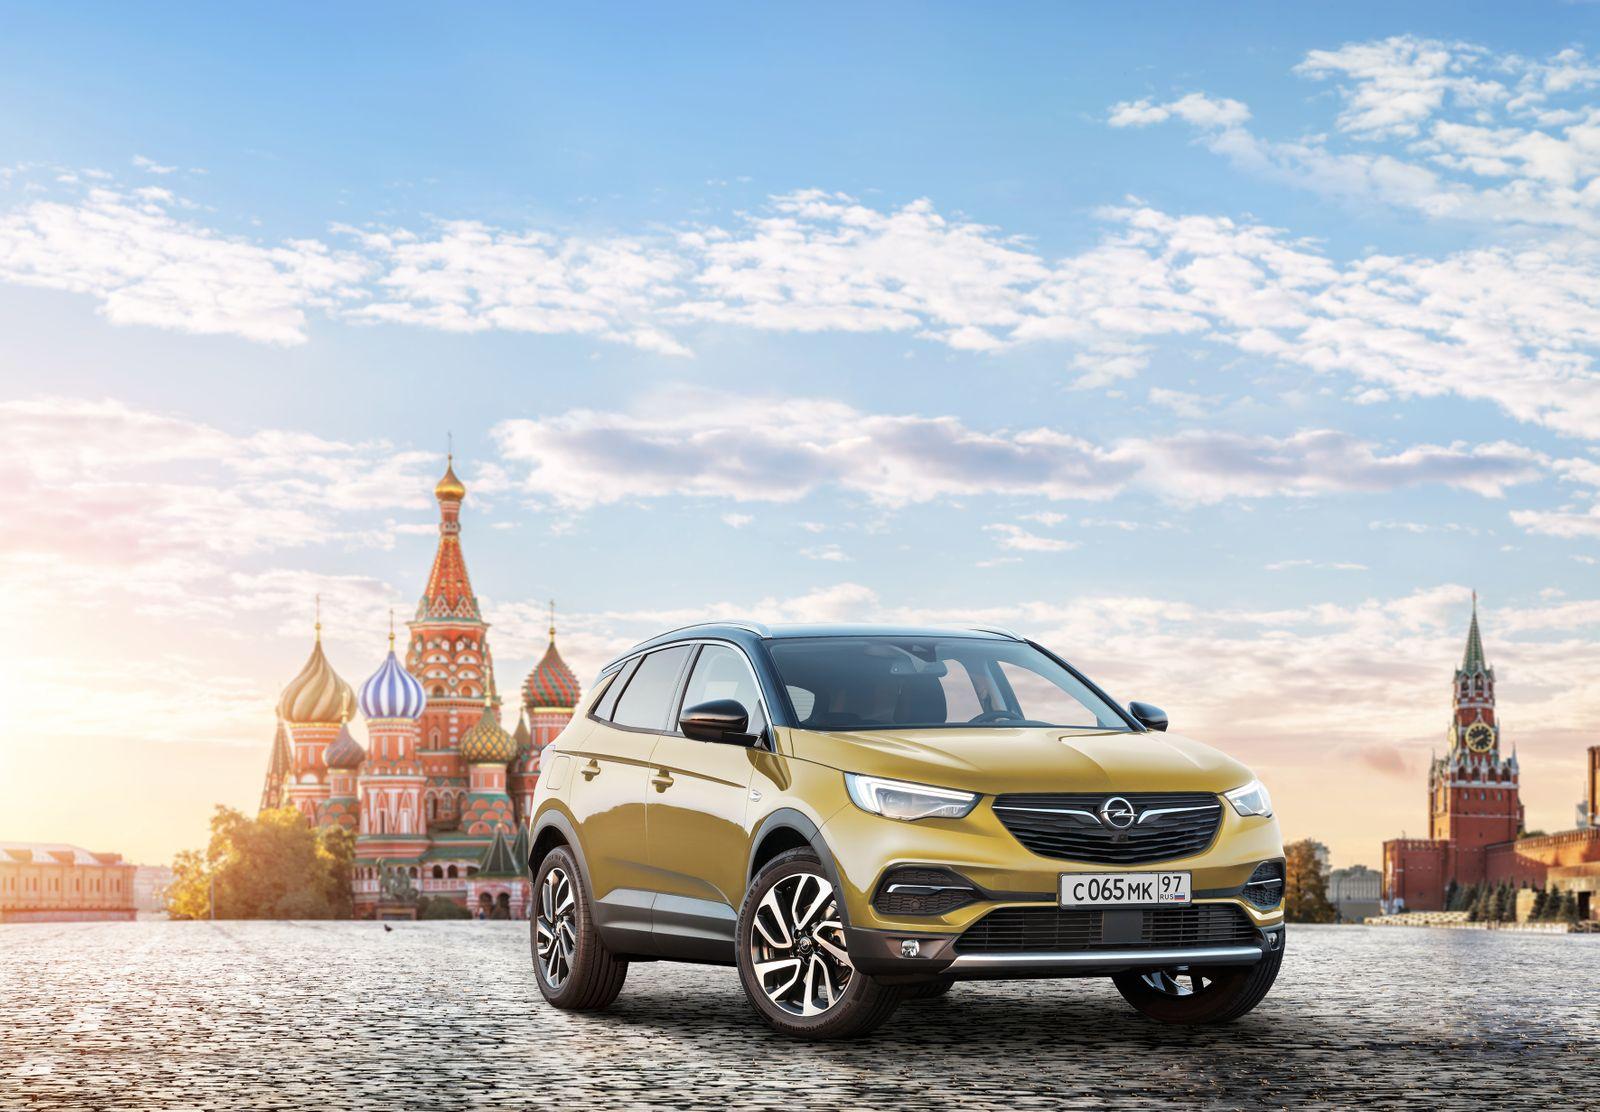 Opel Russland / Grandland X